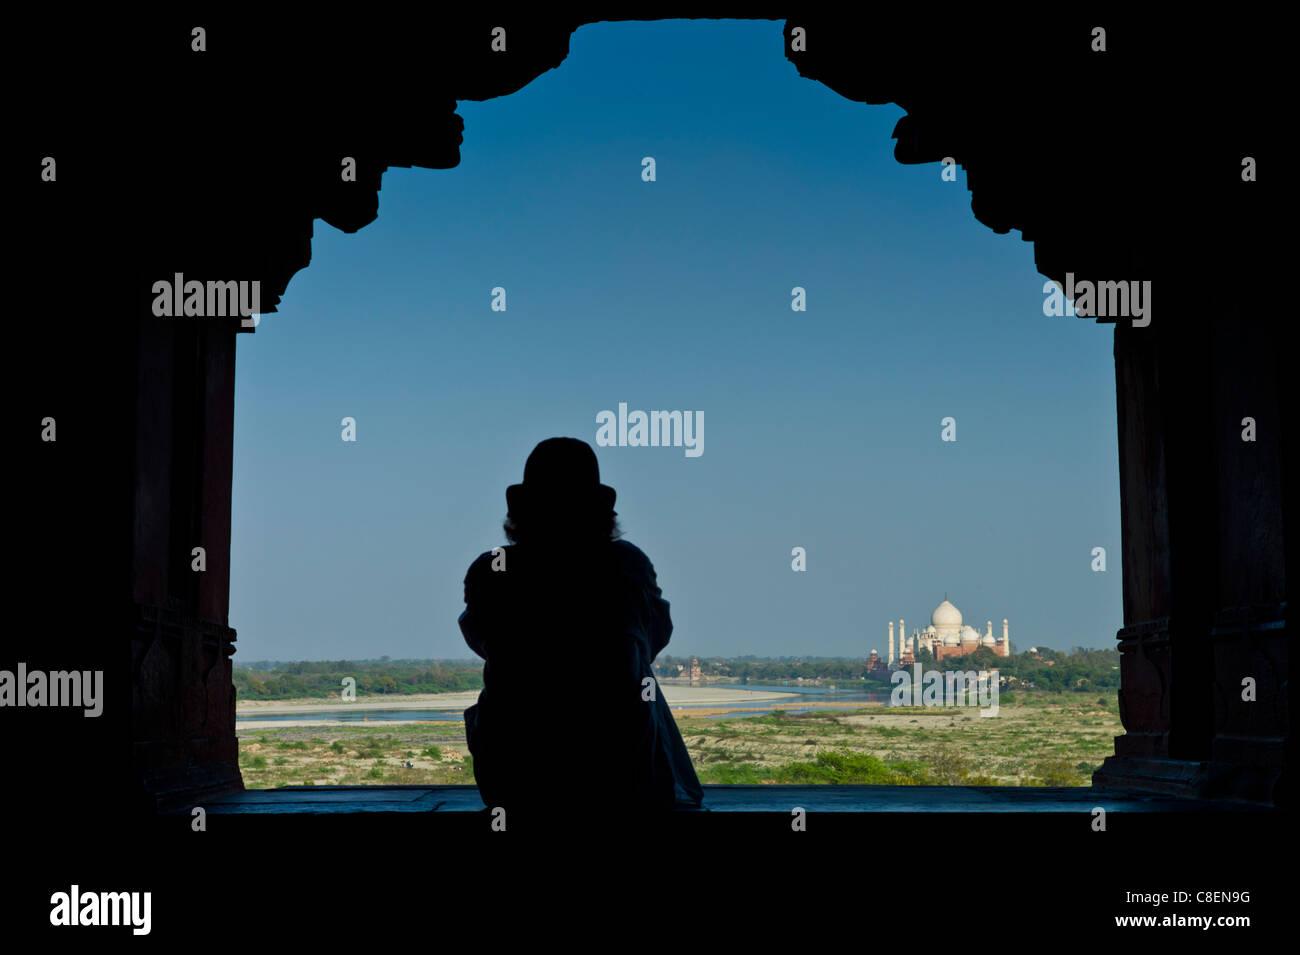 Tourist sitzt zum Taj Mahal vom Khas Mahal Palace in Agra Fort, Indien anzeigen Stockbild